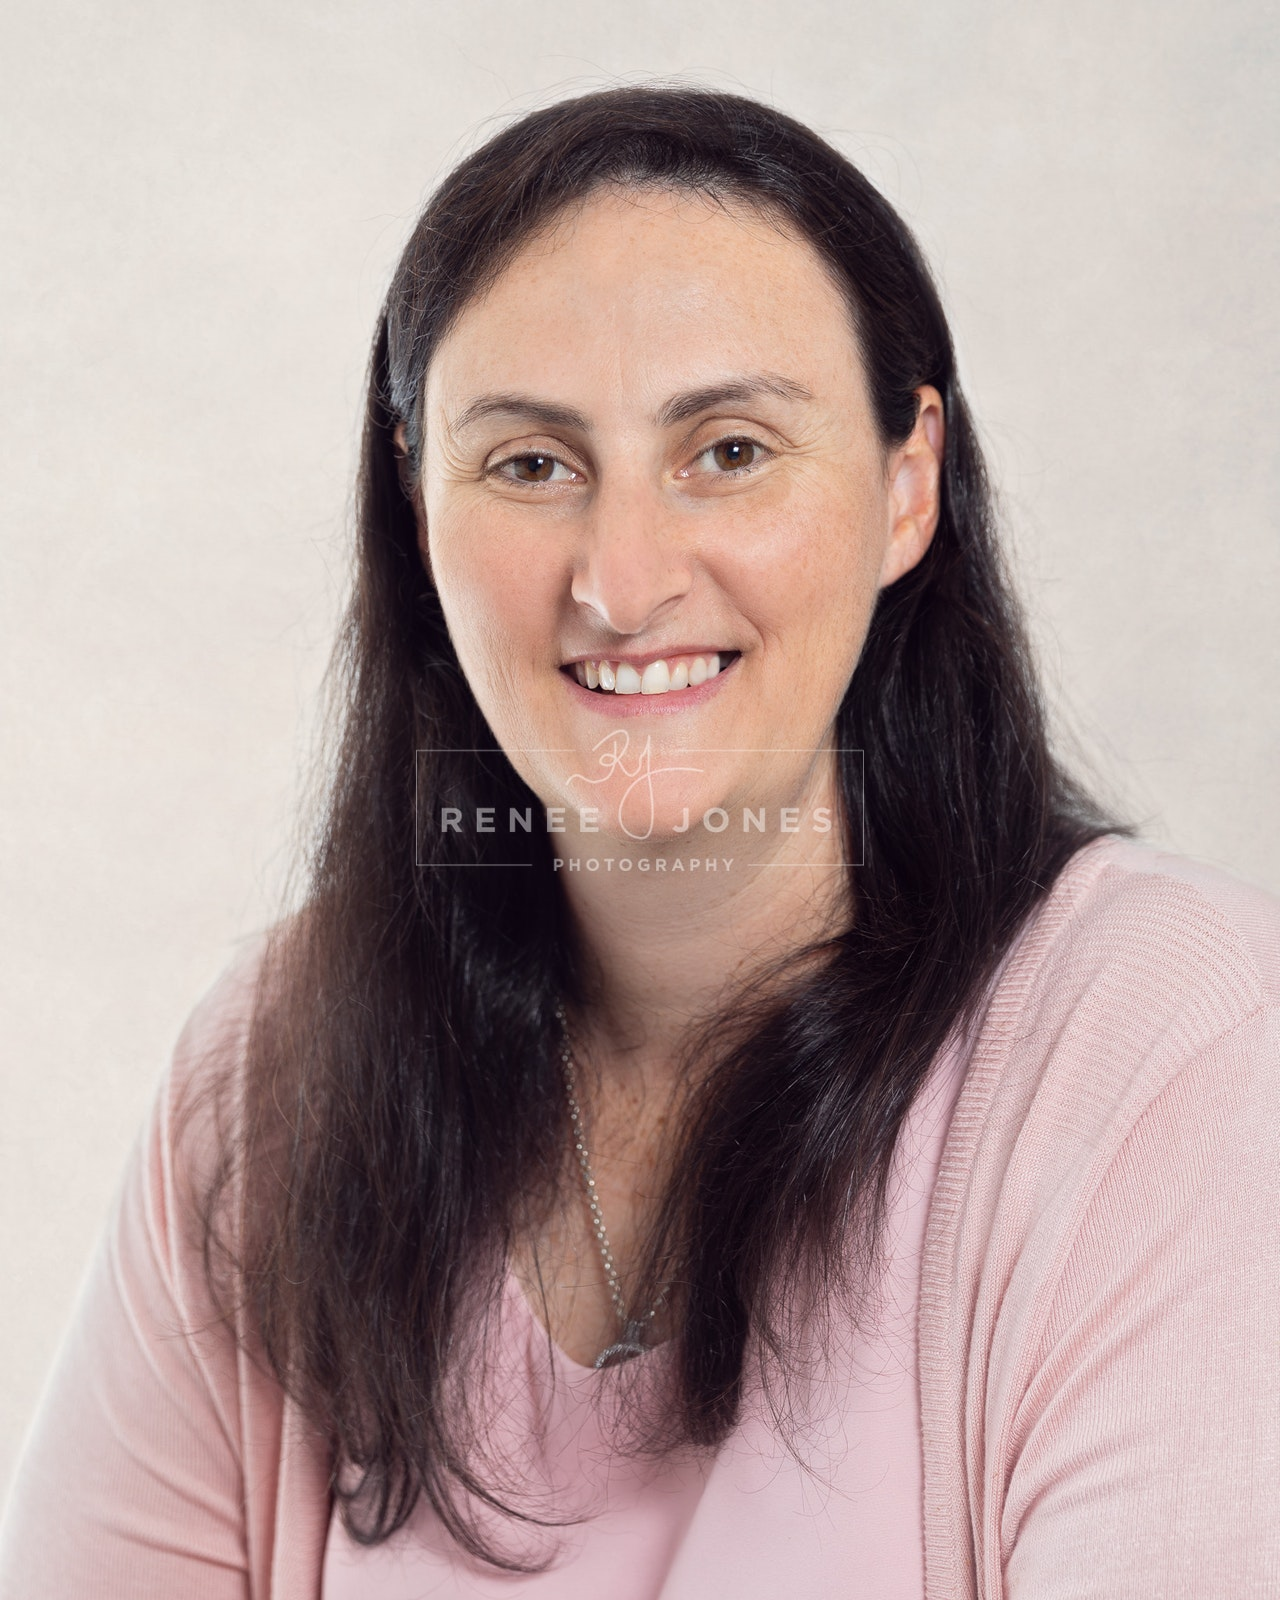 Renee Jones - Brisbane Newborn Photographer - Renee Jones - Brisbane Newborn Photographer